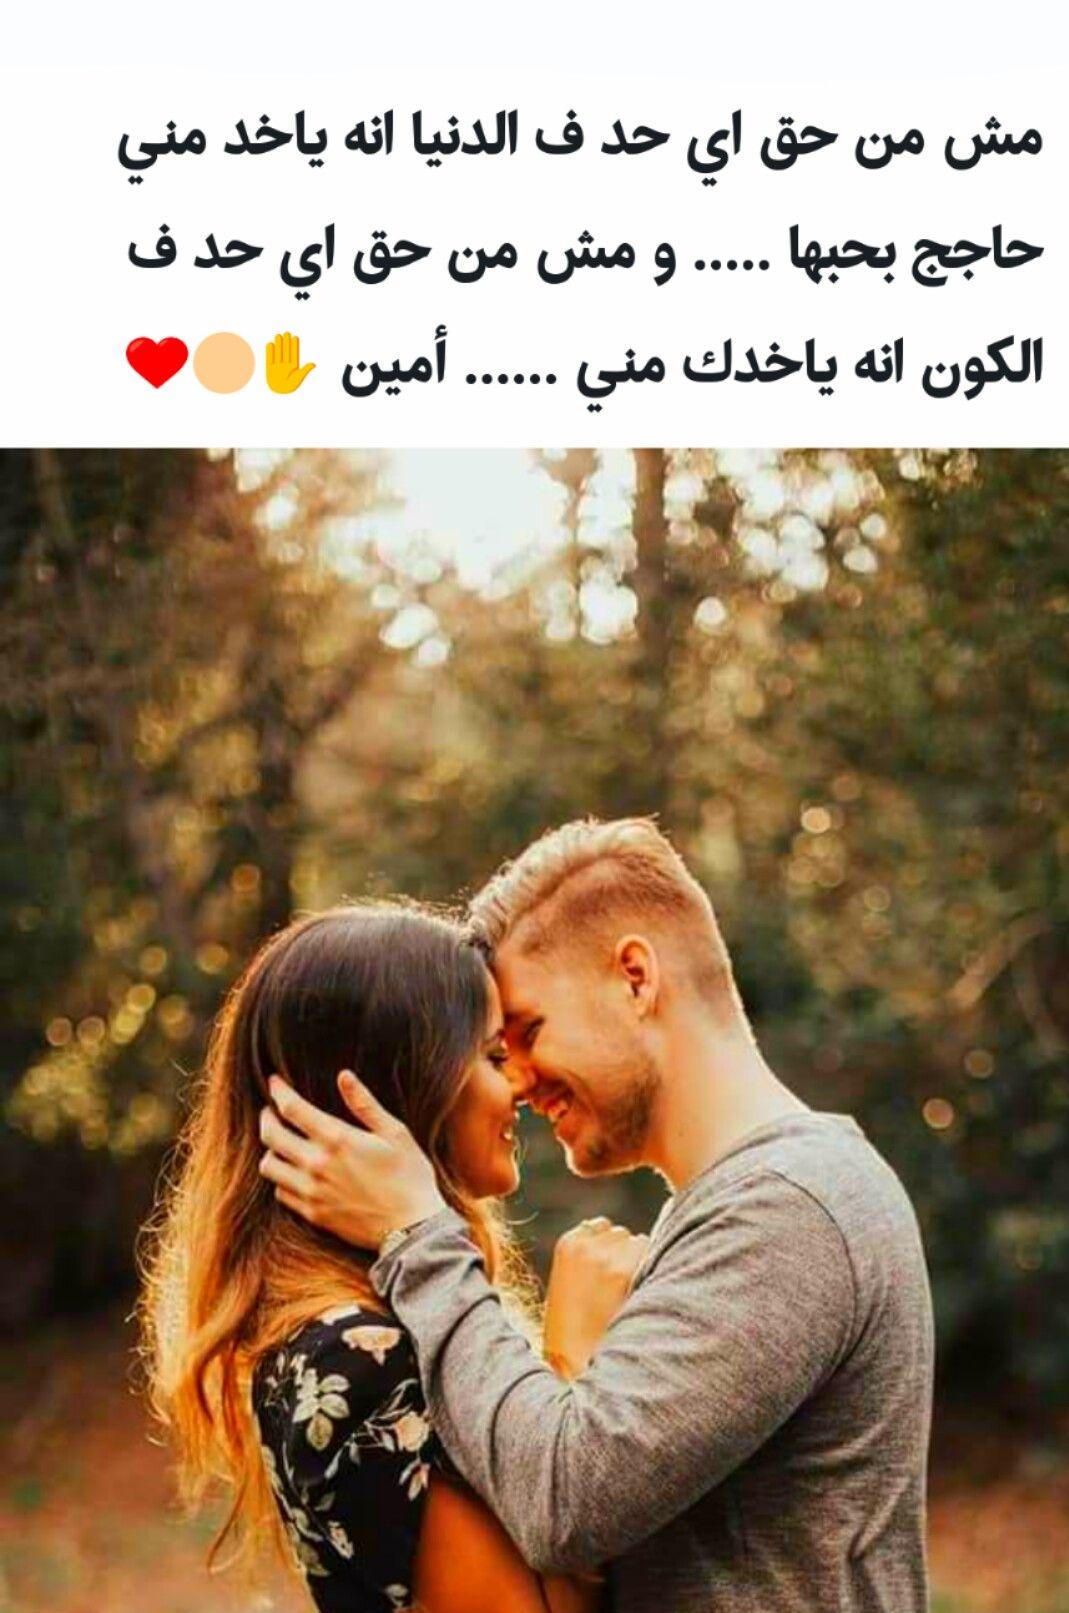 كلمات عشق كلمات عشق حب بلا حدود Couple Photos Scenes Photo